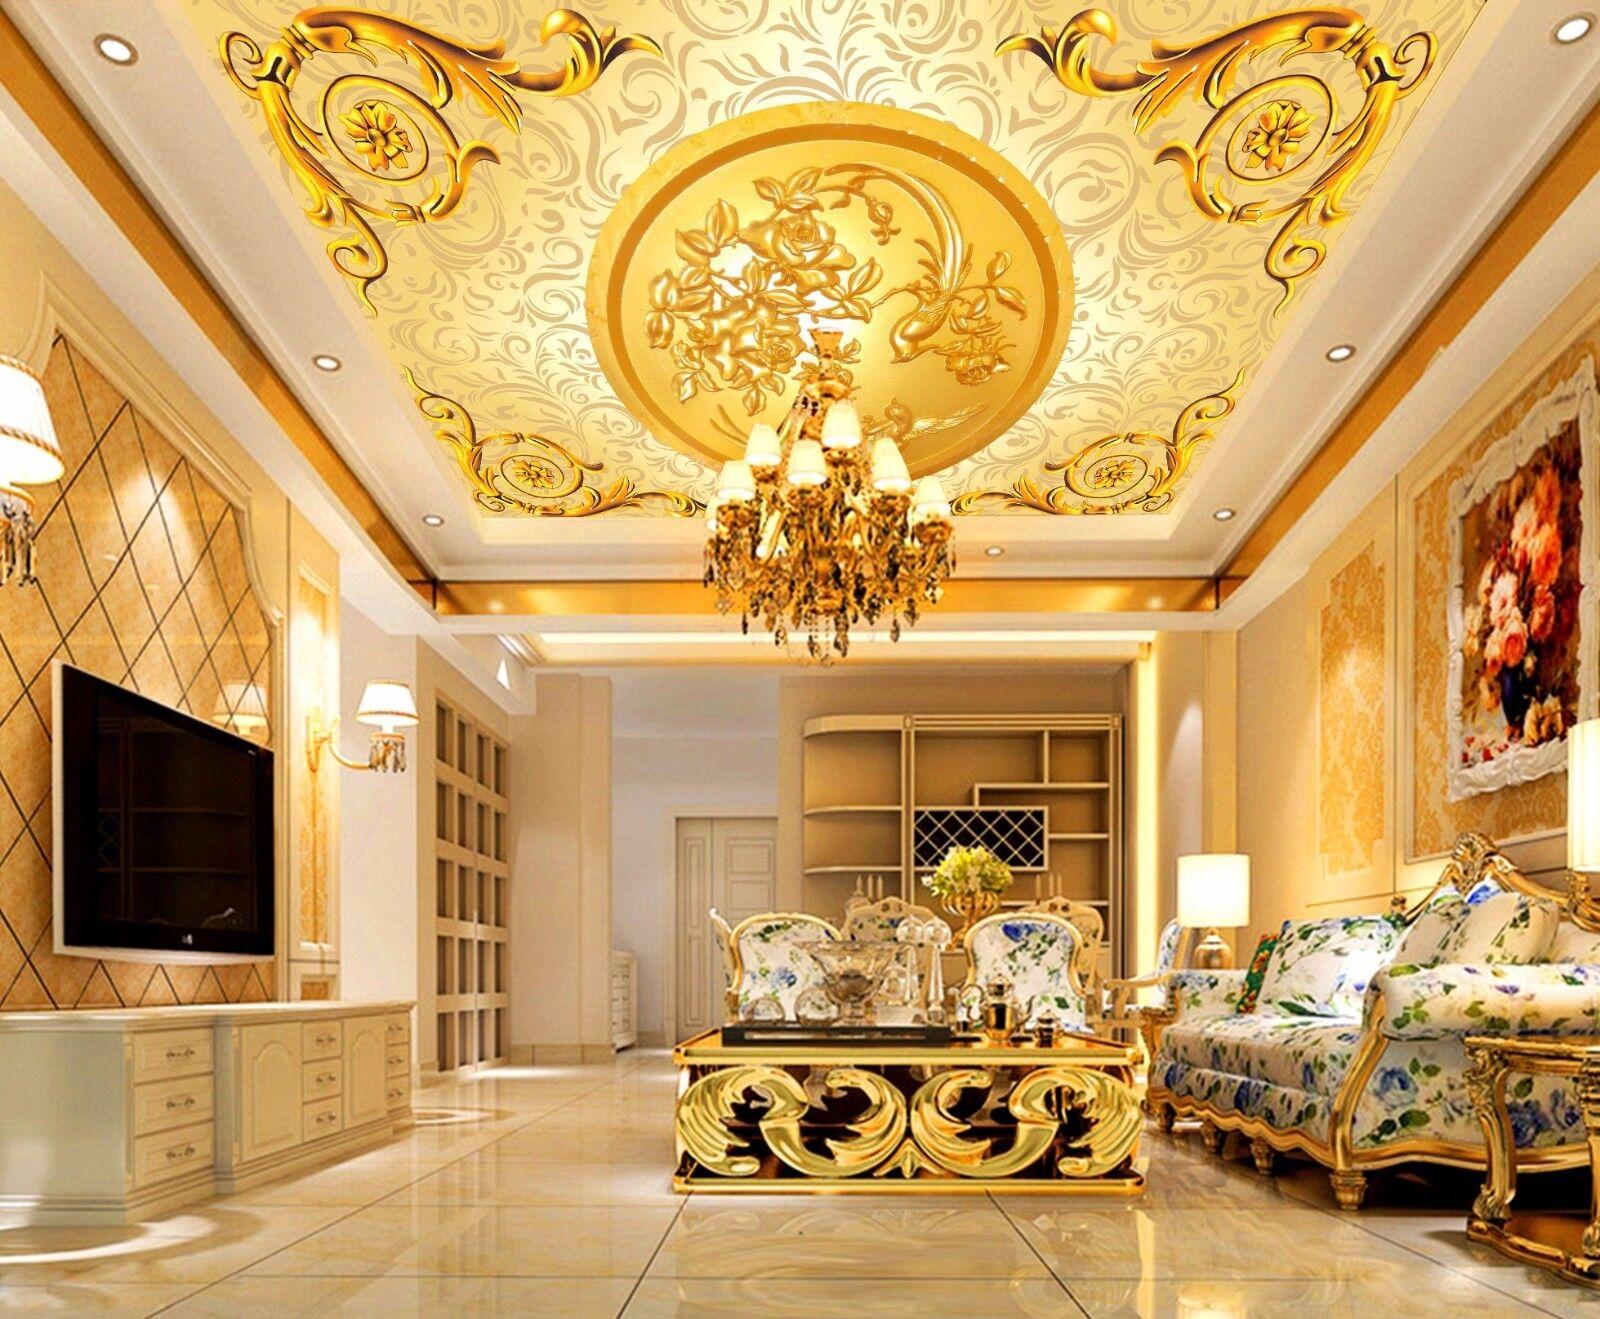 3D Gold Squid Ceiling WallPaper Murals Wall Print Decal Deco AJ WALLPAPER AU